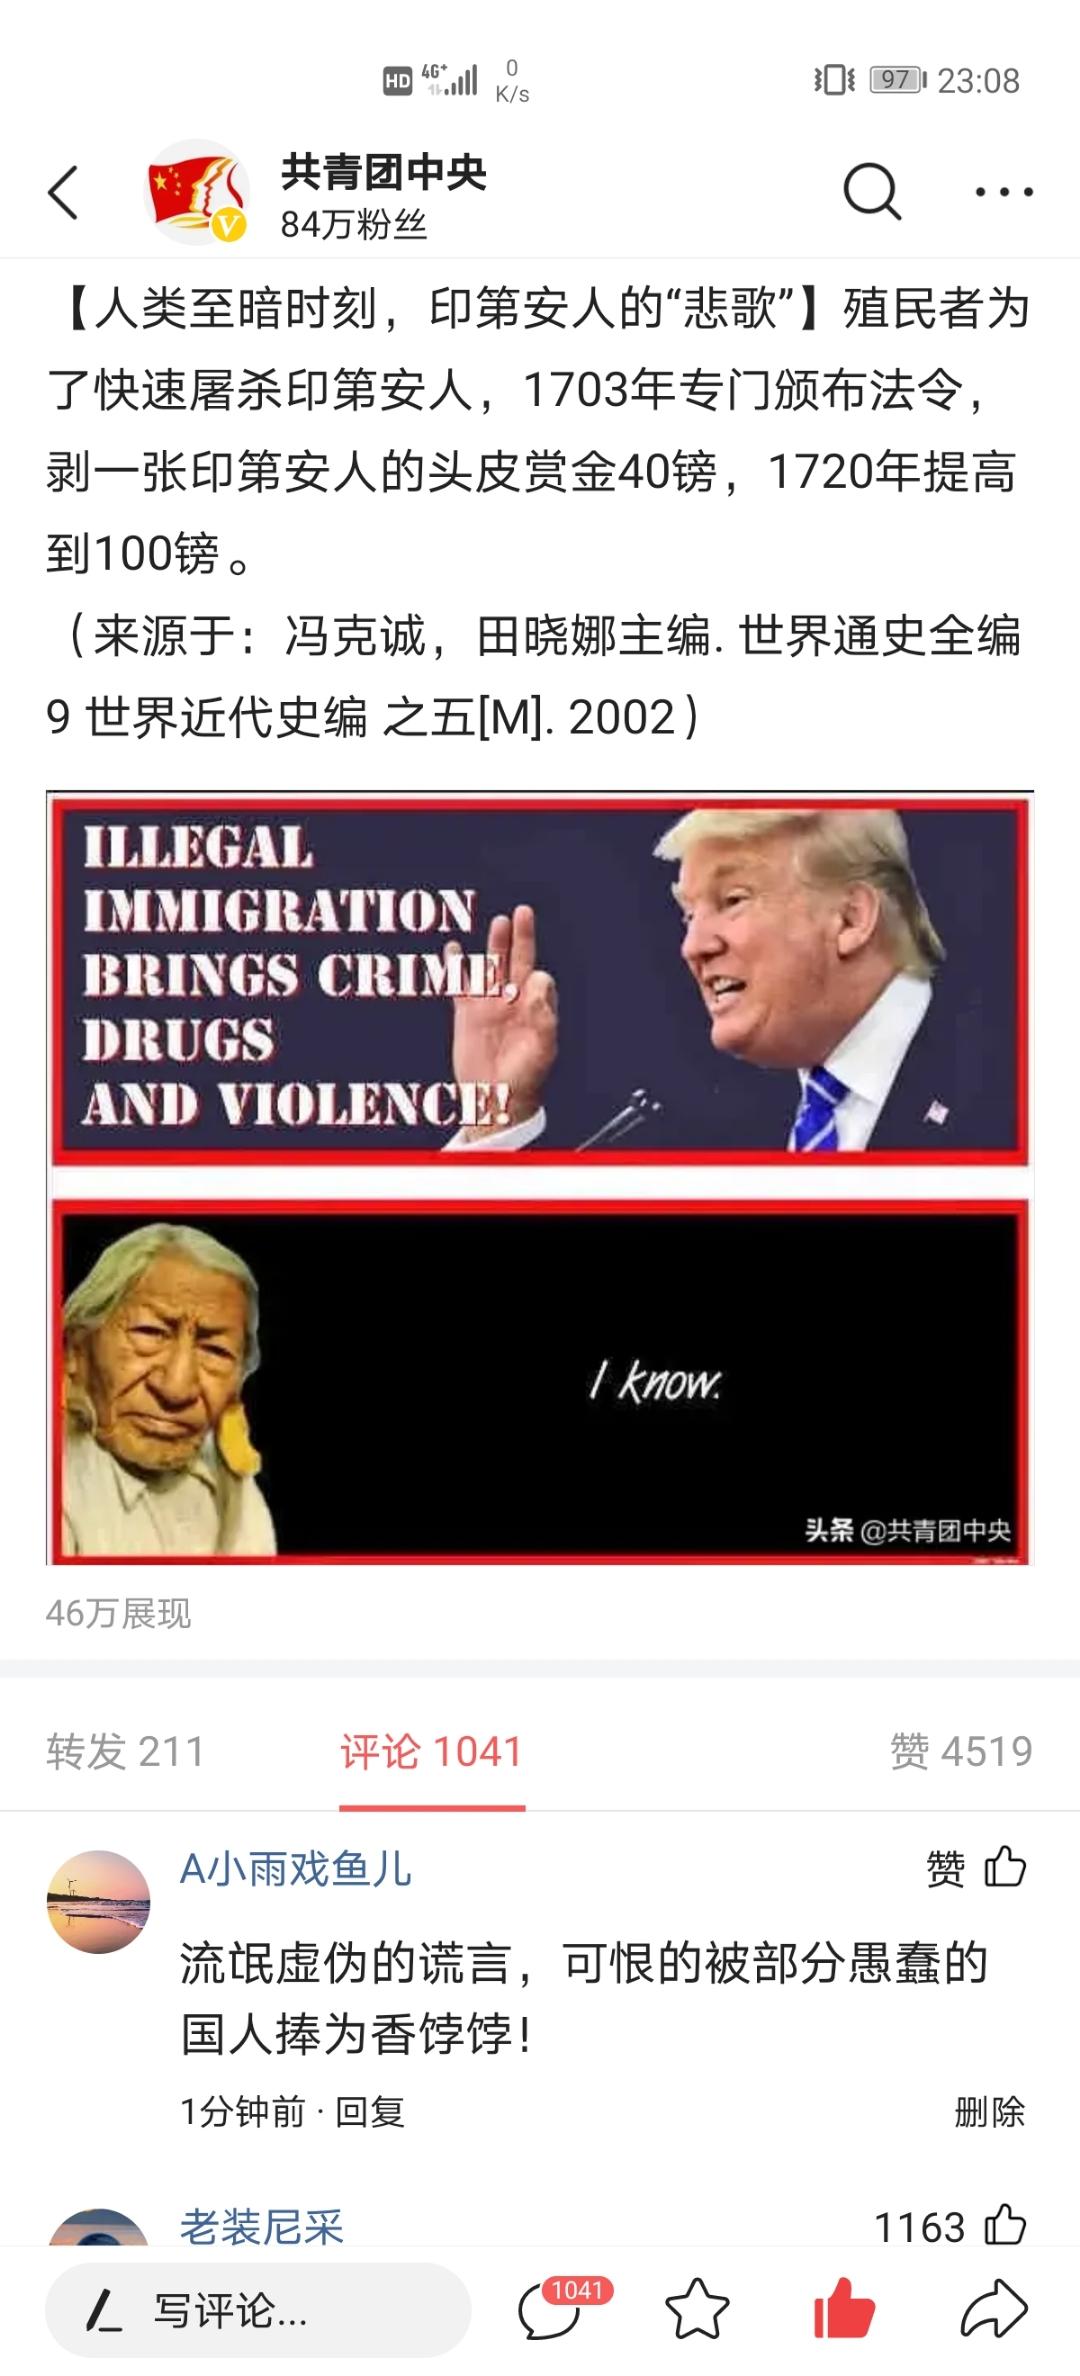 Screenshot_20201126_230848_com.ss.android.article.news.jpg